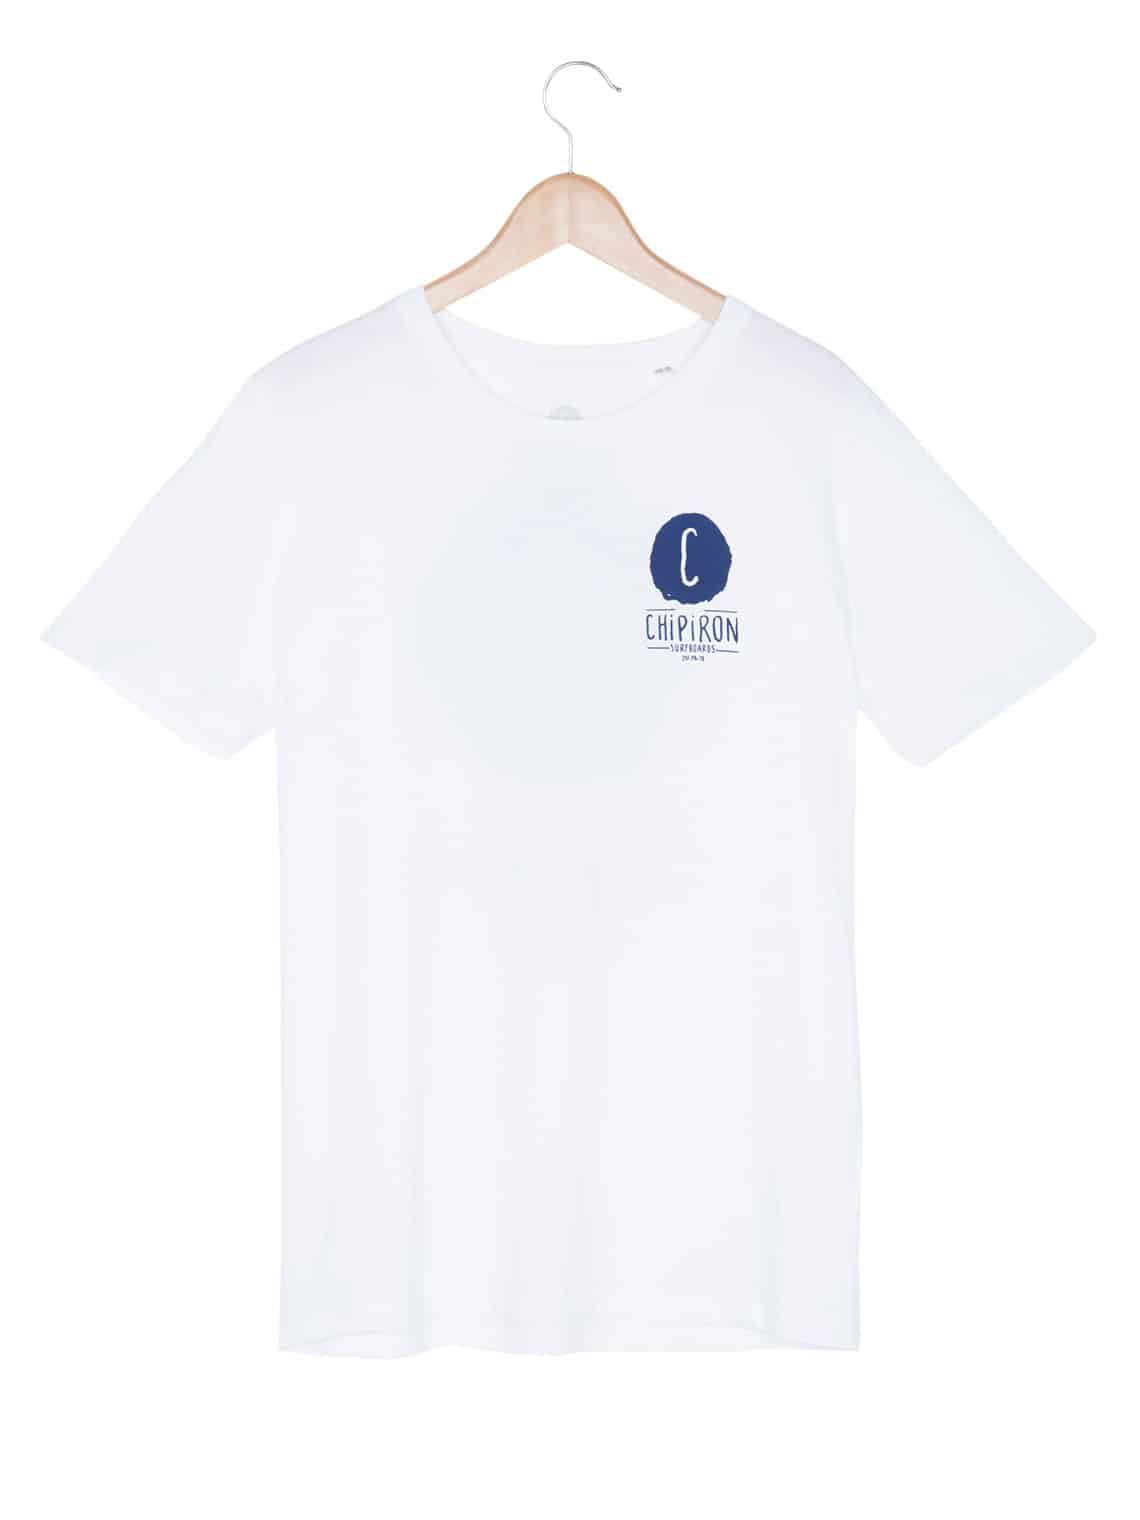 T-shirt Corpo back print blanc Chipiron